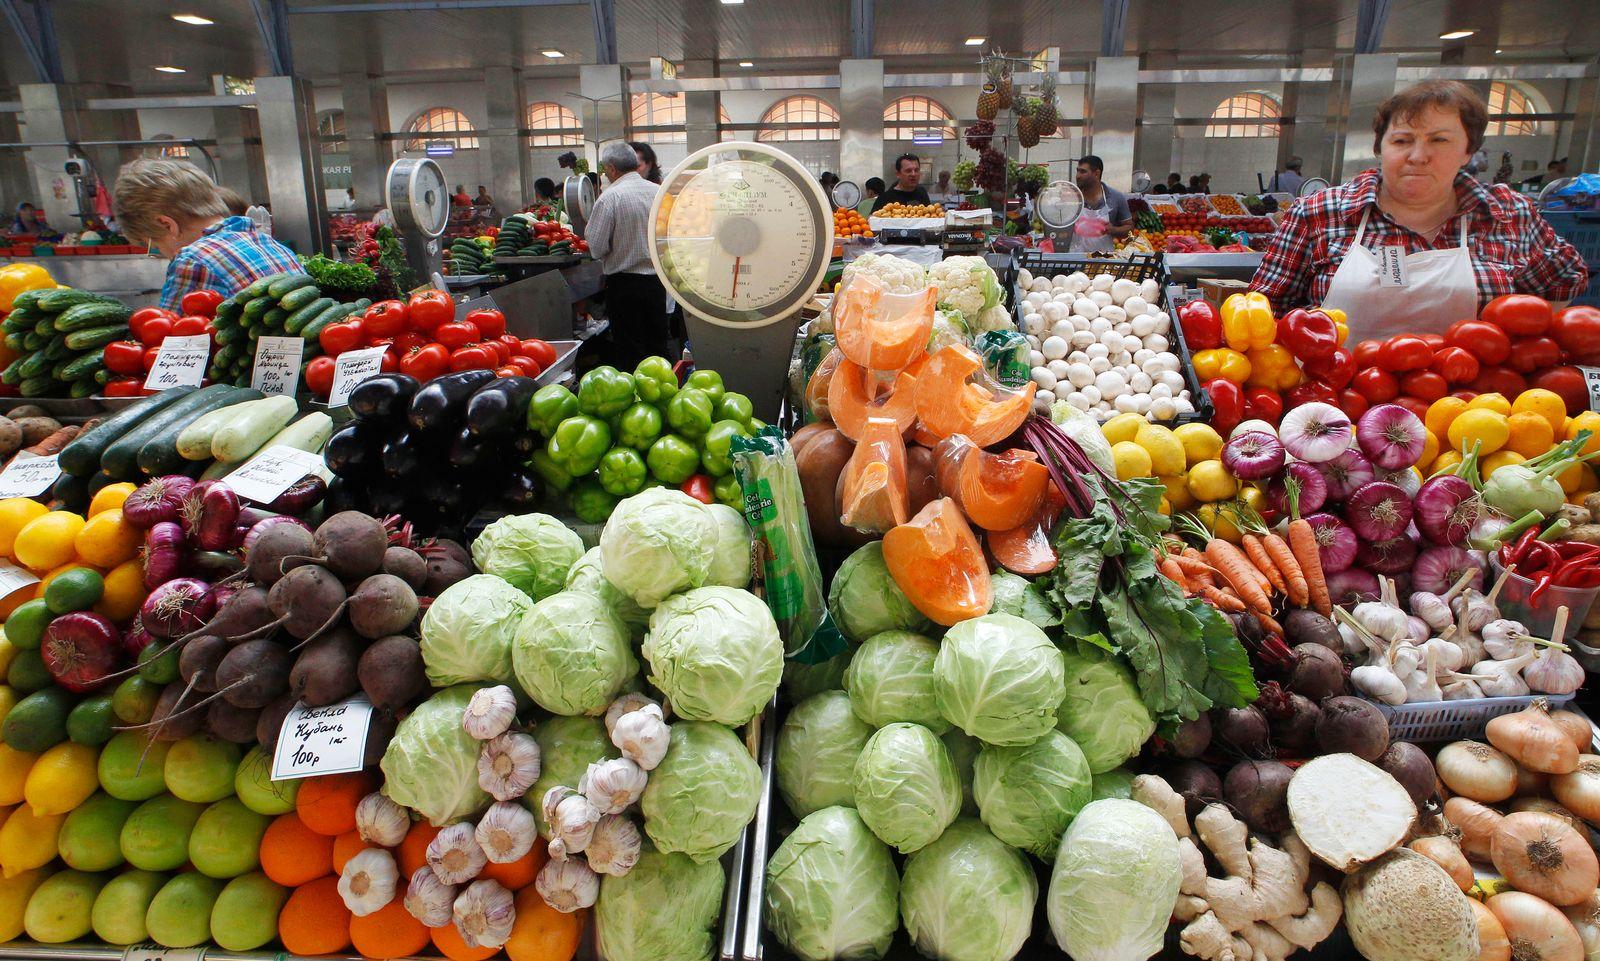 Russland / Obst / Gemüse / Import